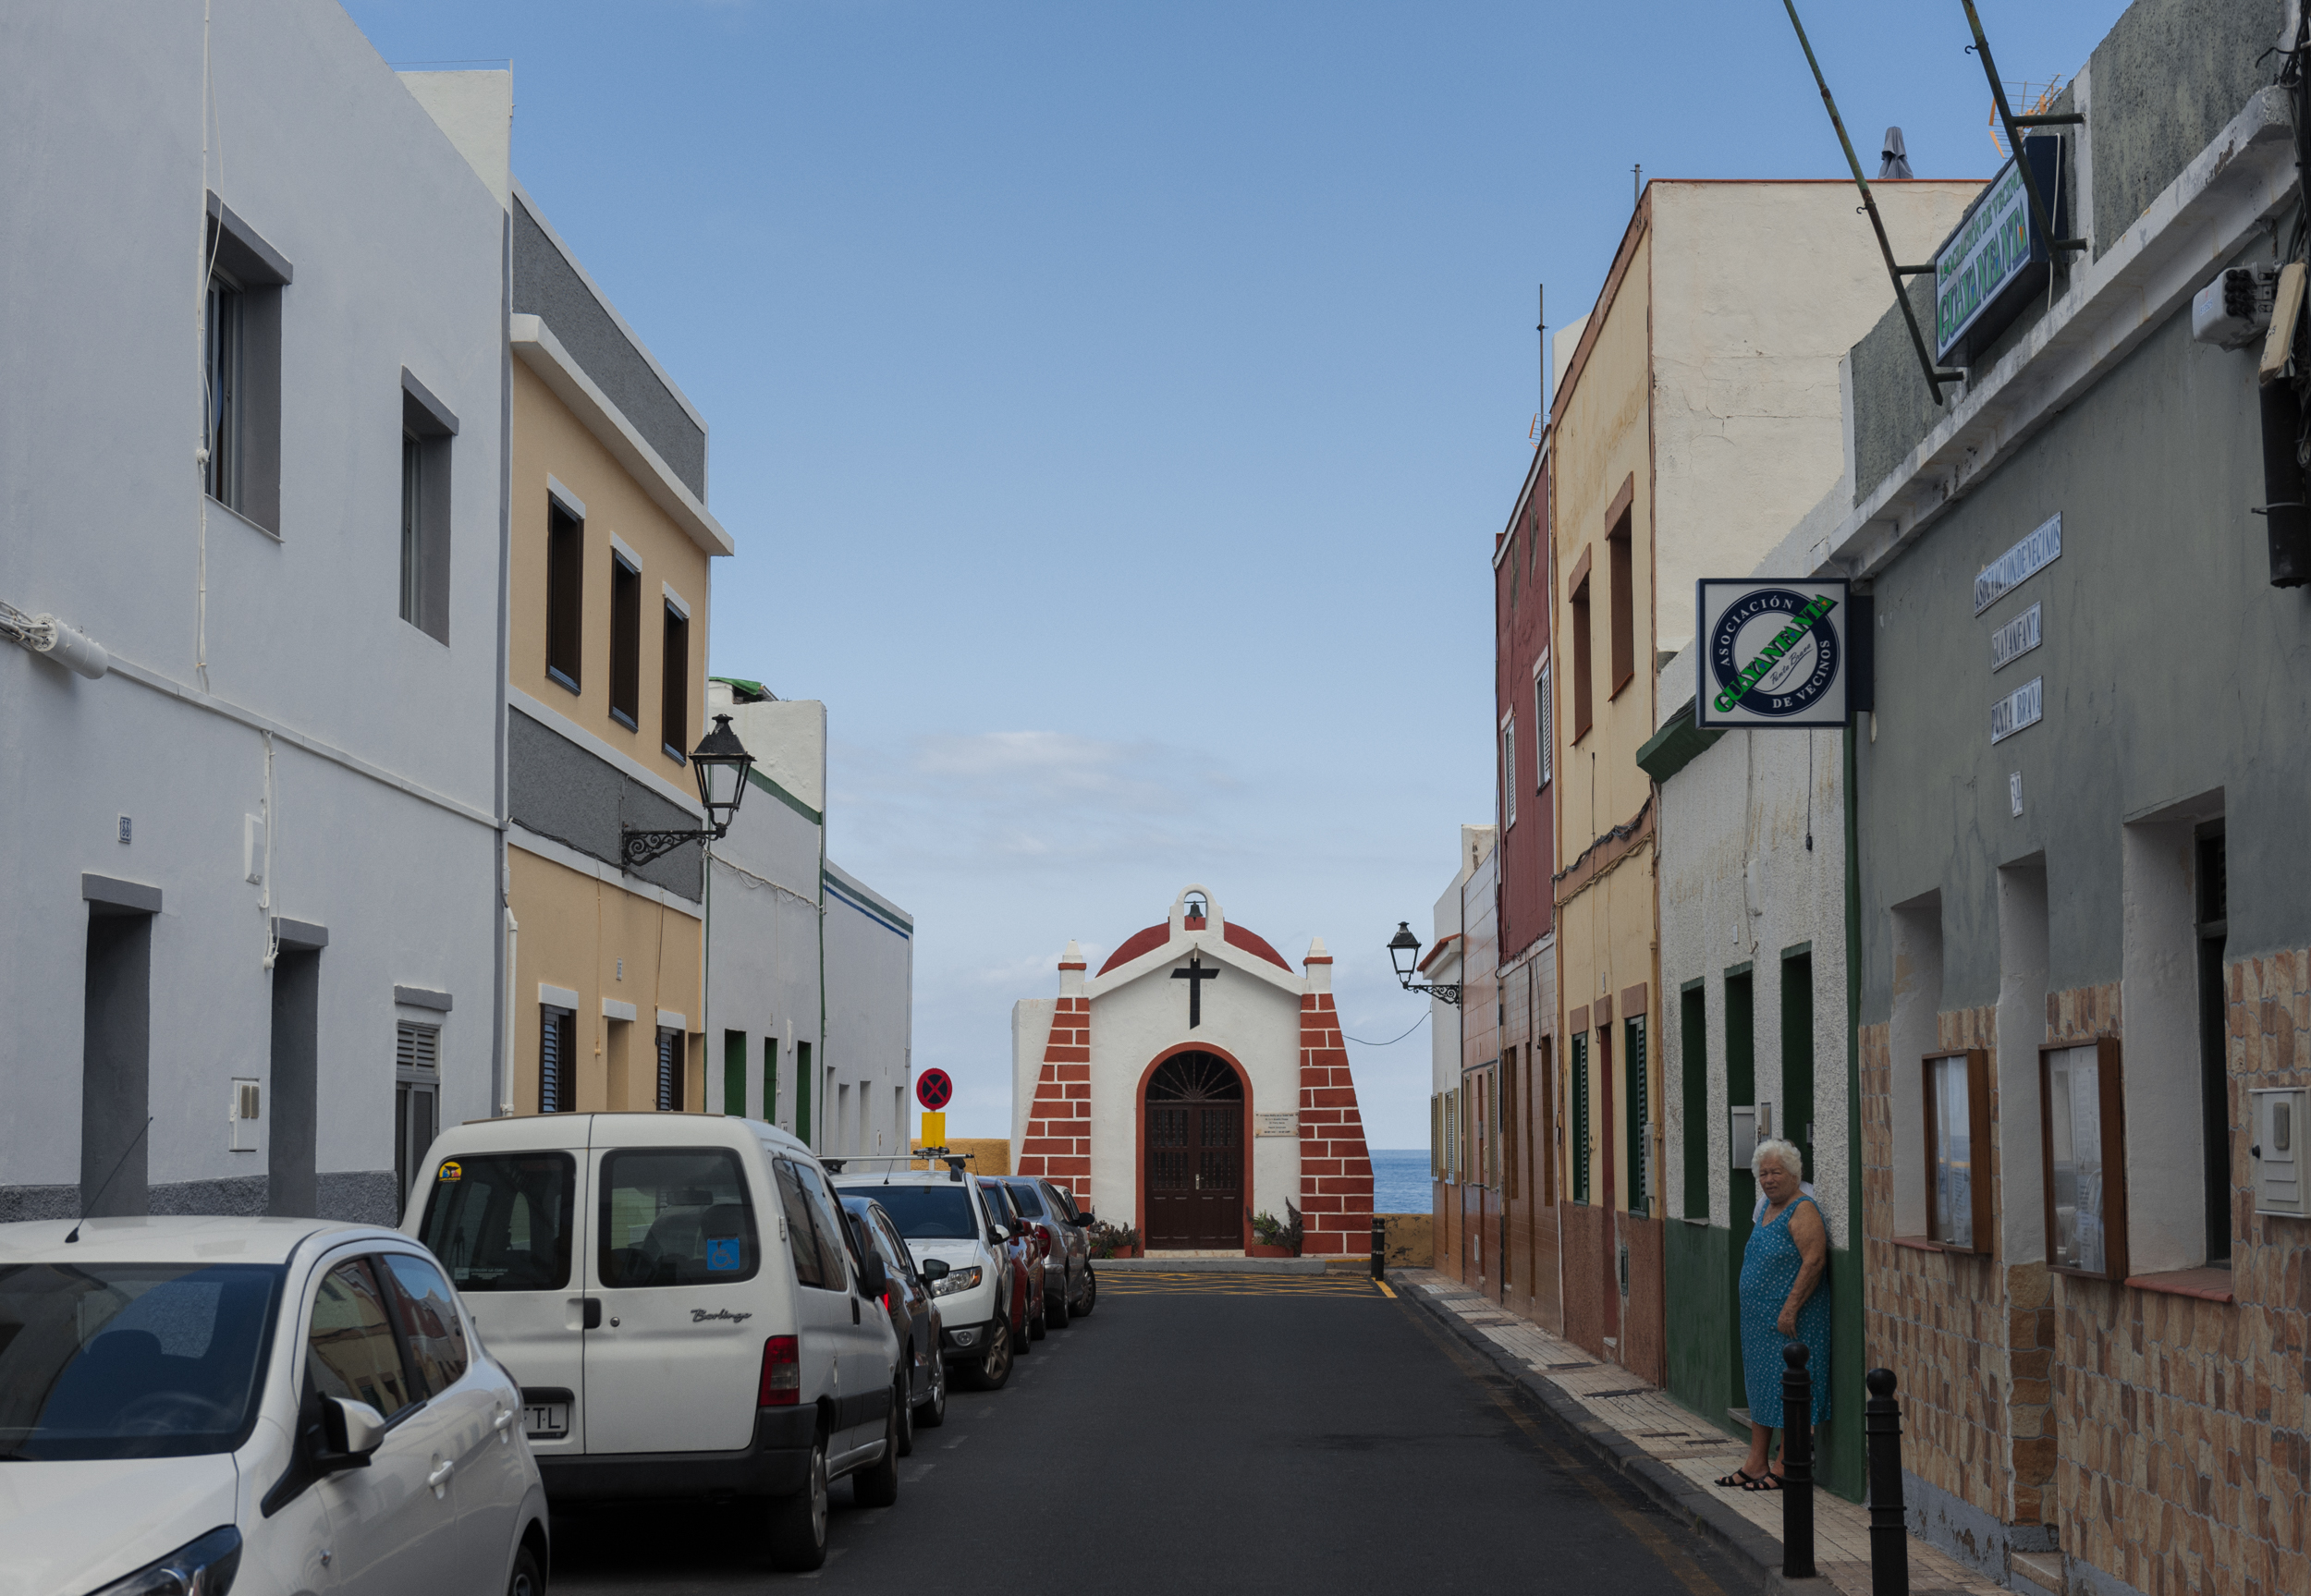 Tenerife, Canary Islands (2017)